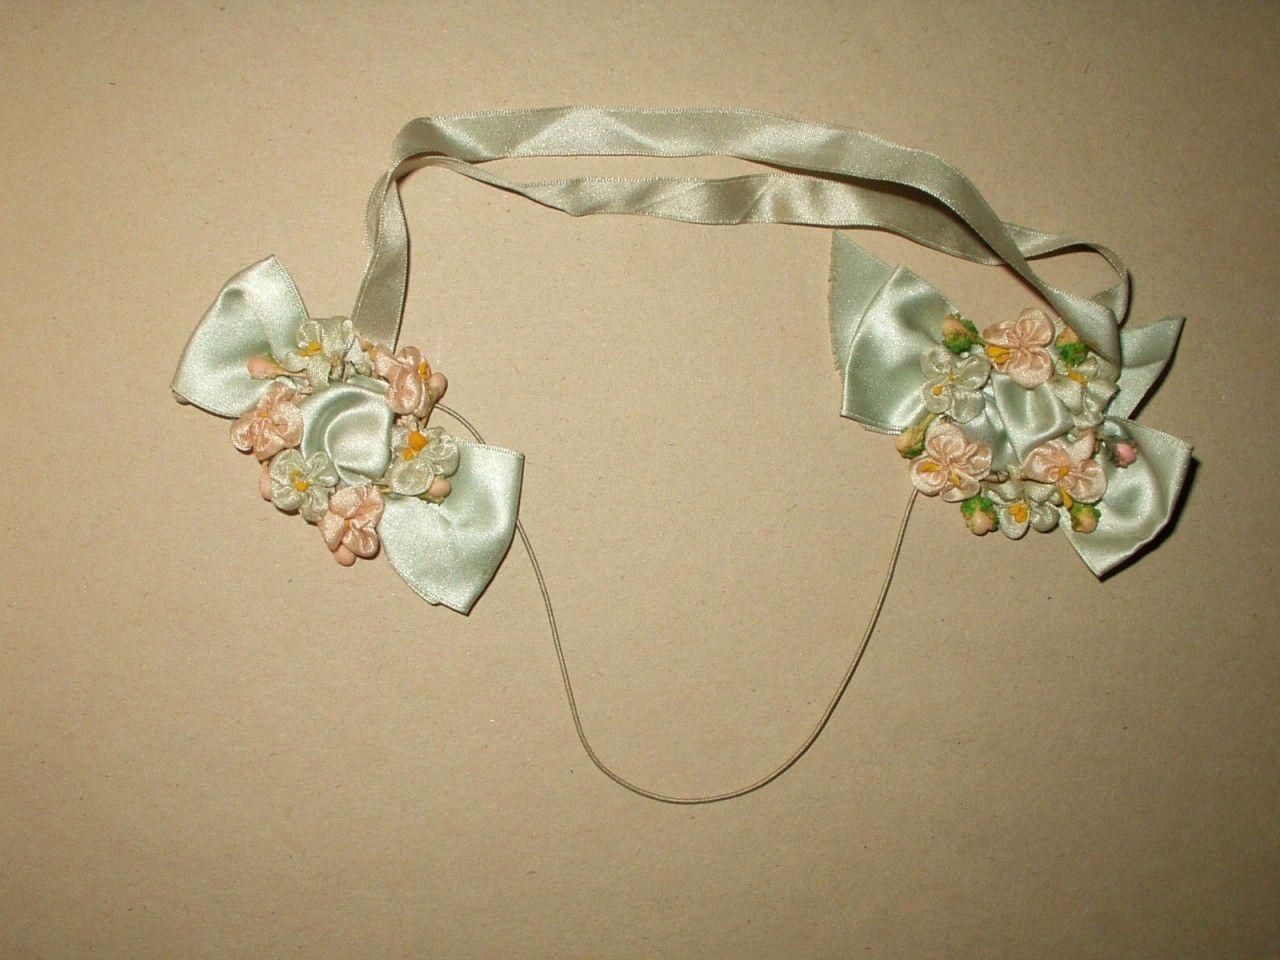 Silk Ribbon Double 1920 Flapper Rosette Embellishment Trim - The Gatherings Antique Vintage